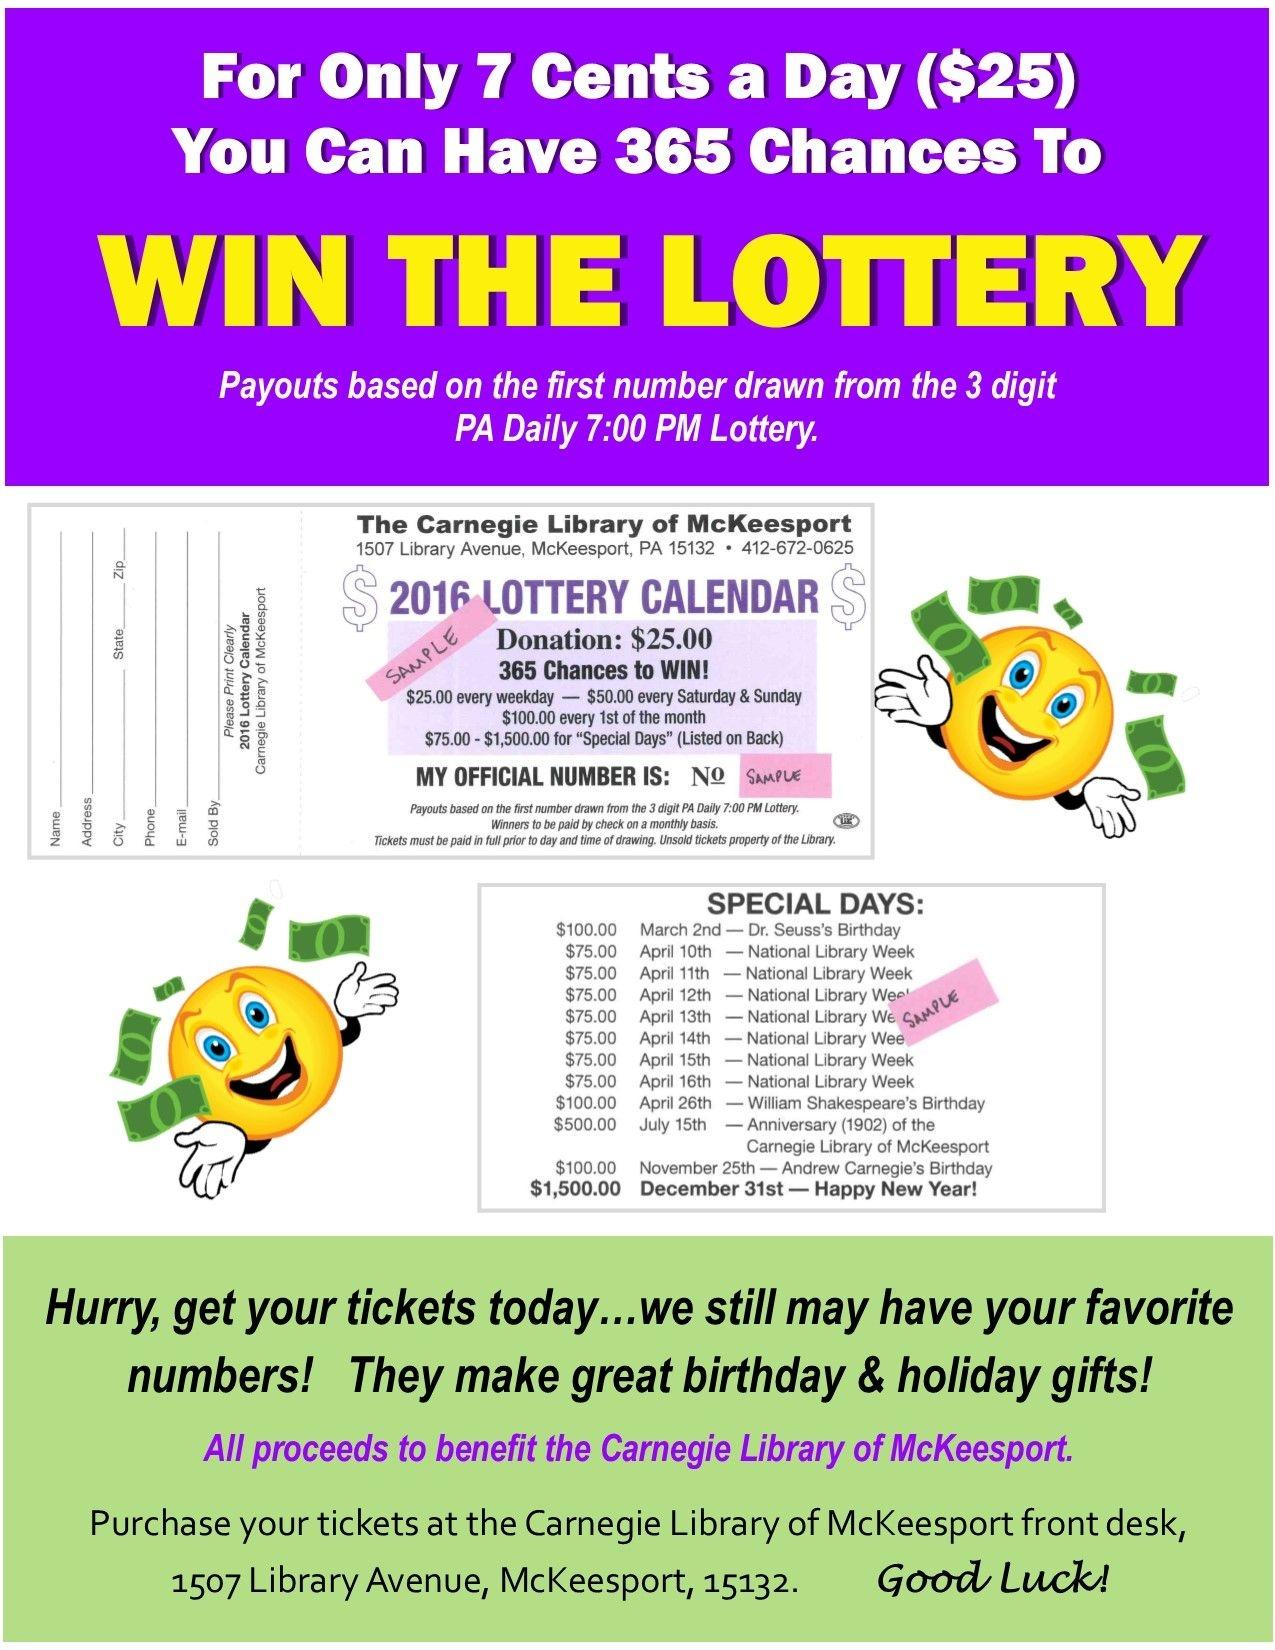 pa lottery calendar fundraiser